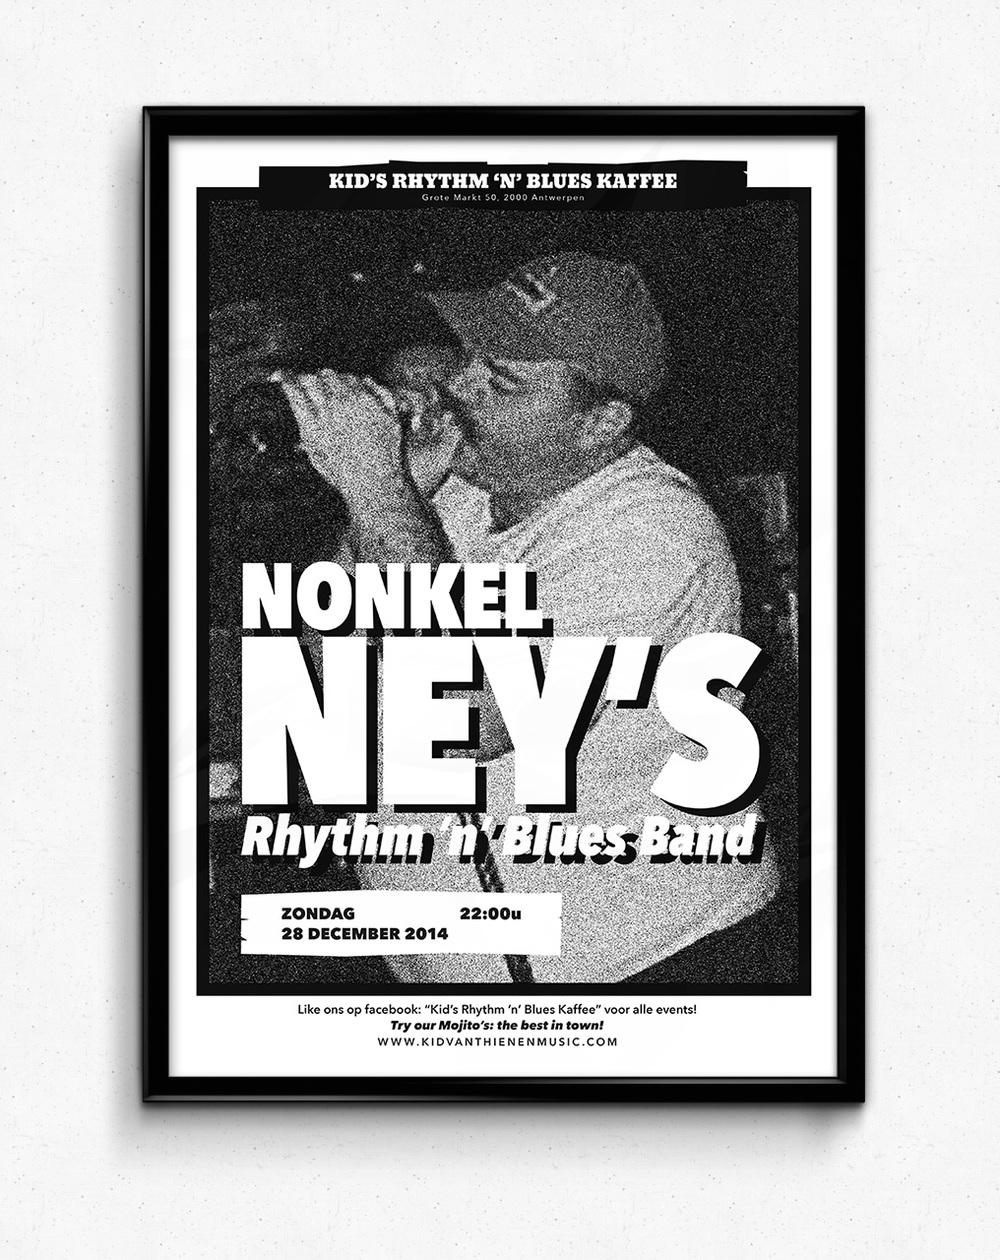 nonkel-ney-2014.jpg